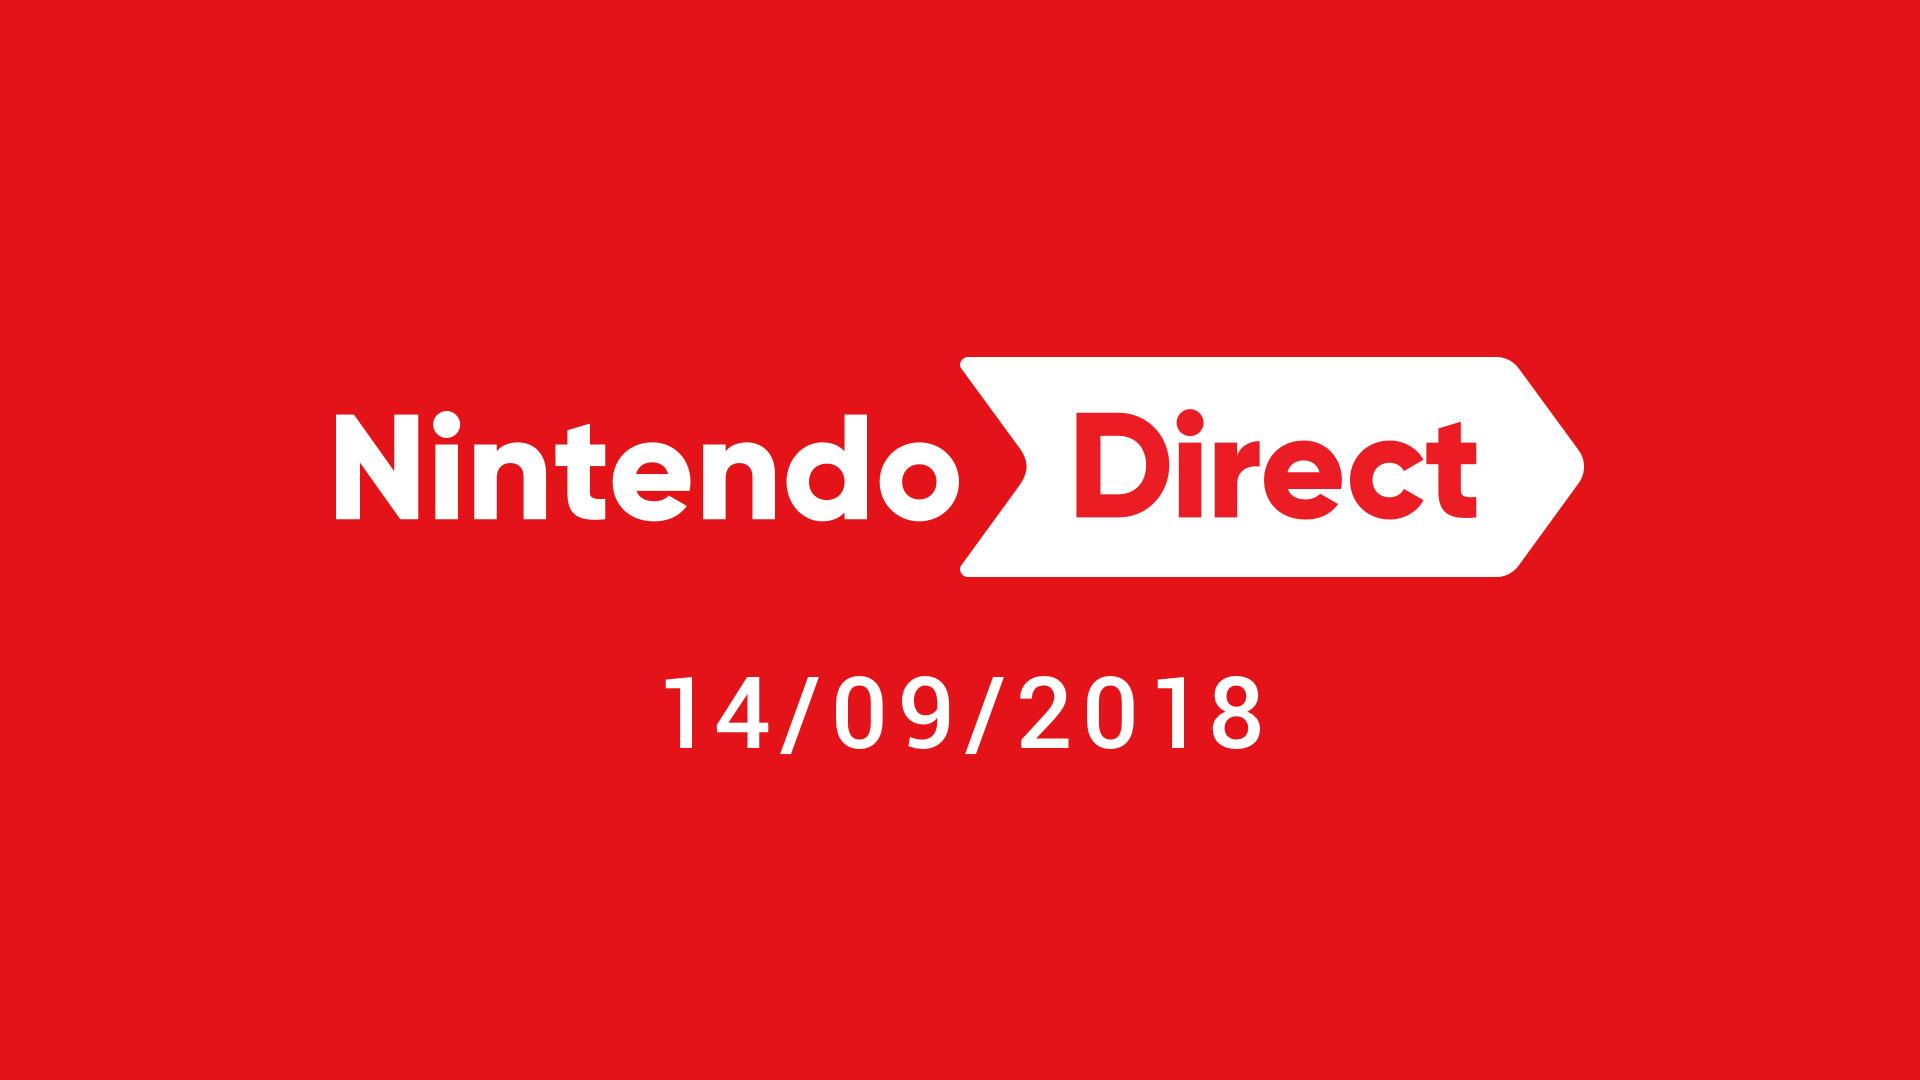 nintendo direct 14 septiembre 2018